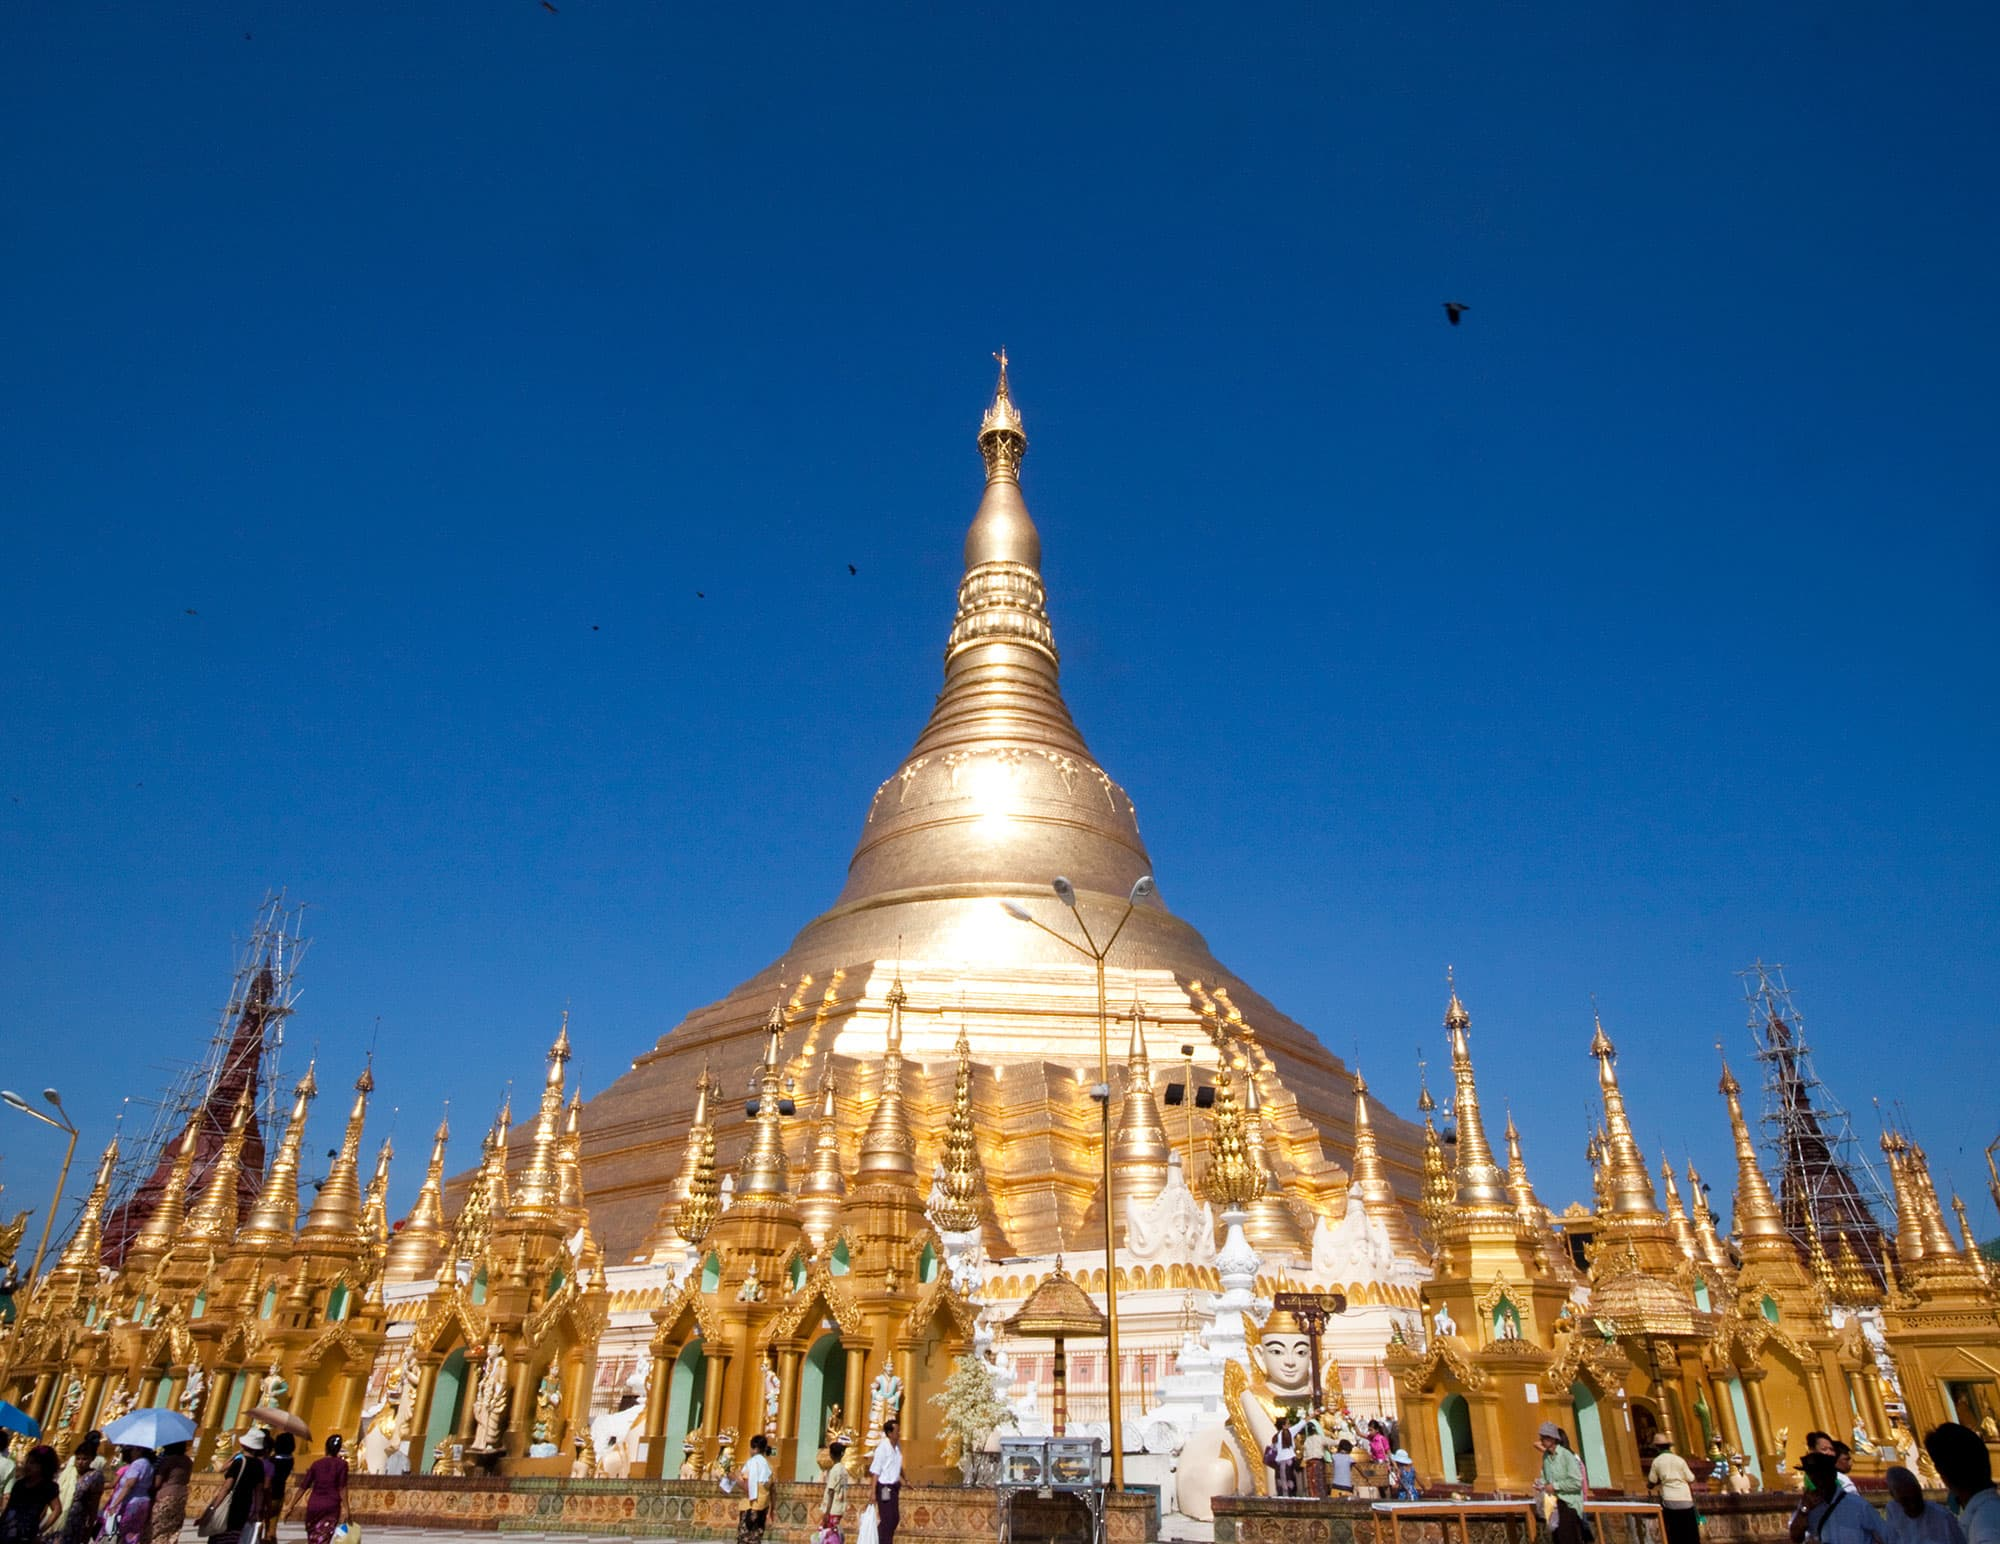 Myanmar espléndido, viaje de lujo - Myanmar- imagen #7